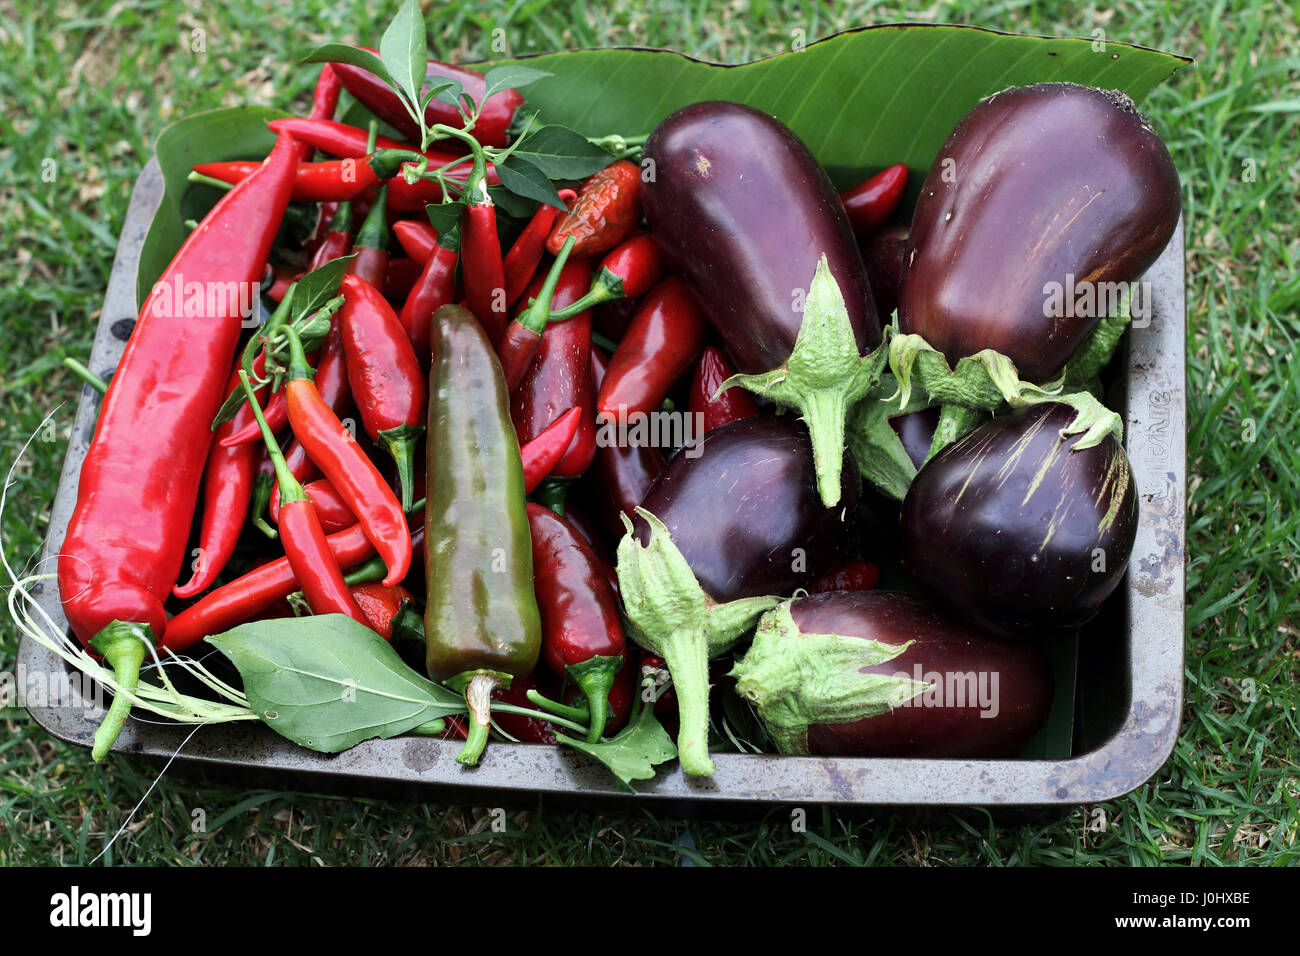 Freshly picked homegrown Black Beauty eggplants and chilis - Stock Image